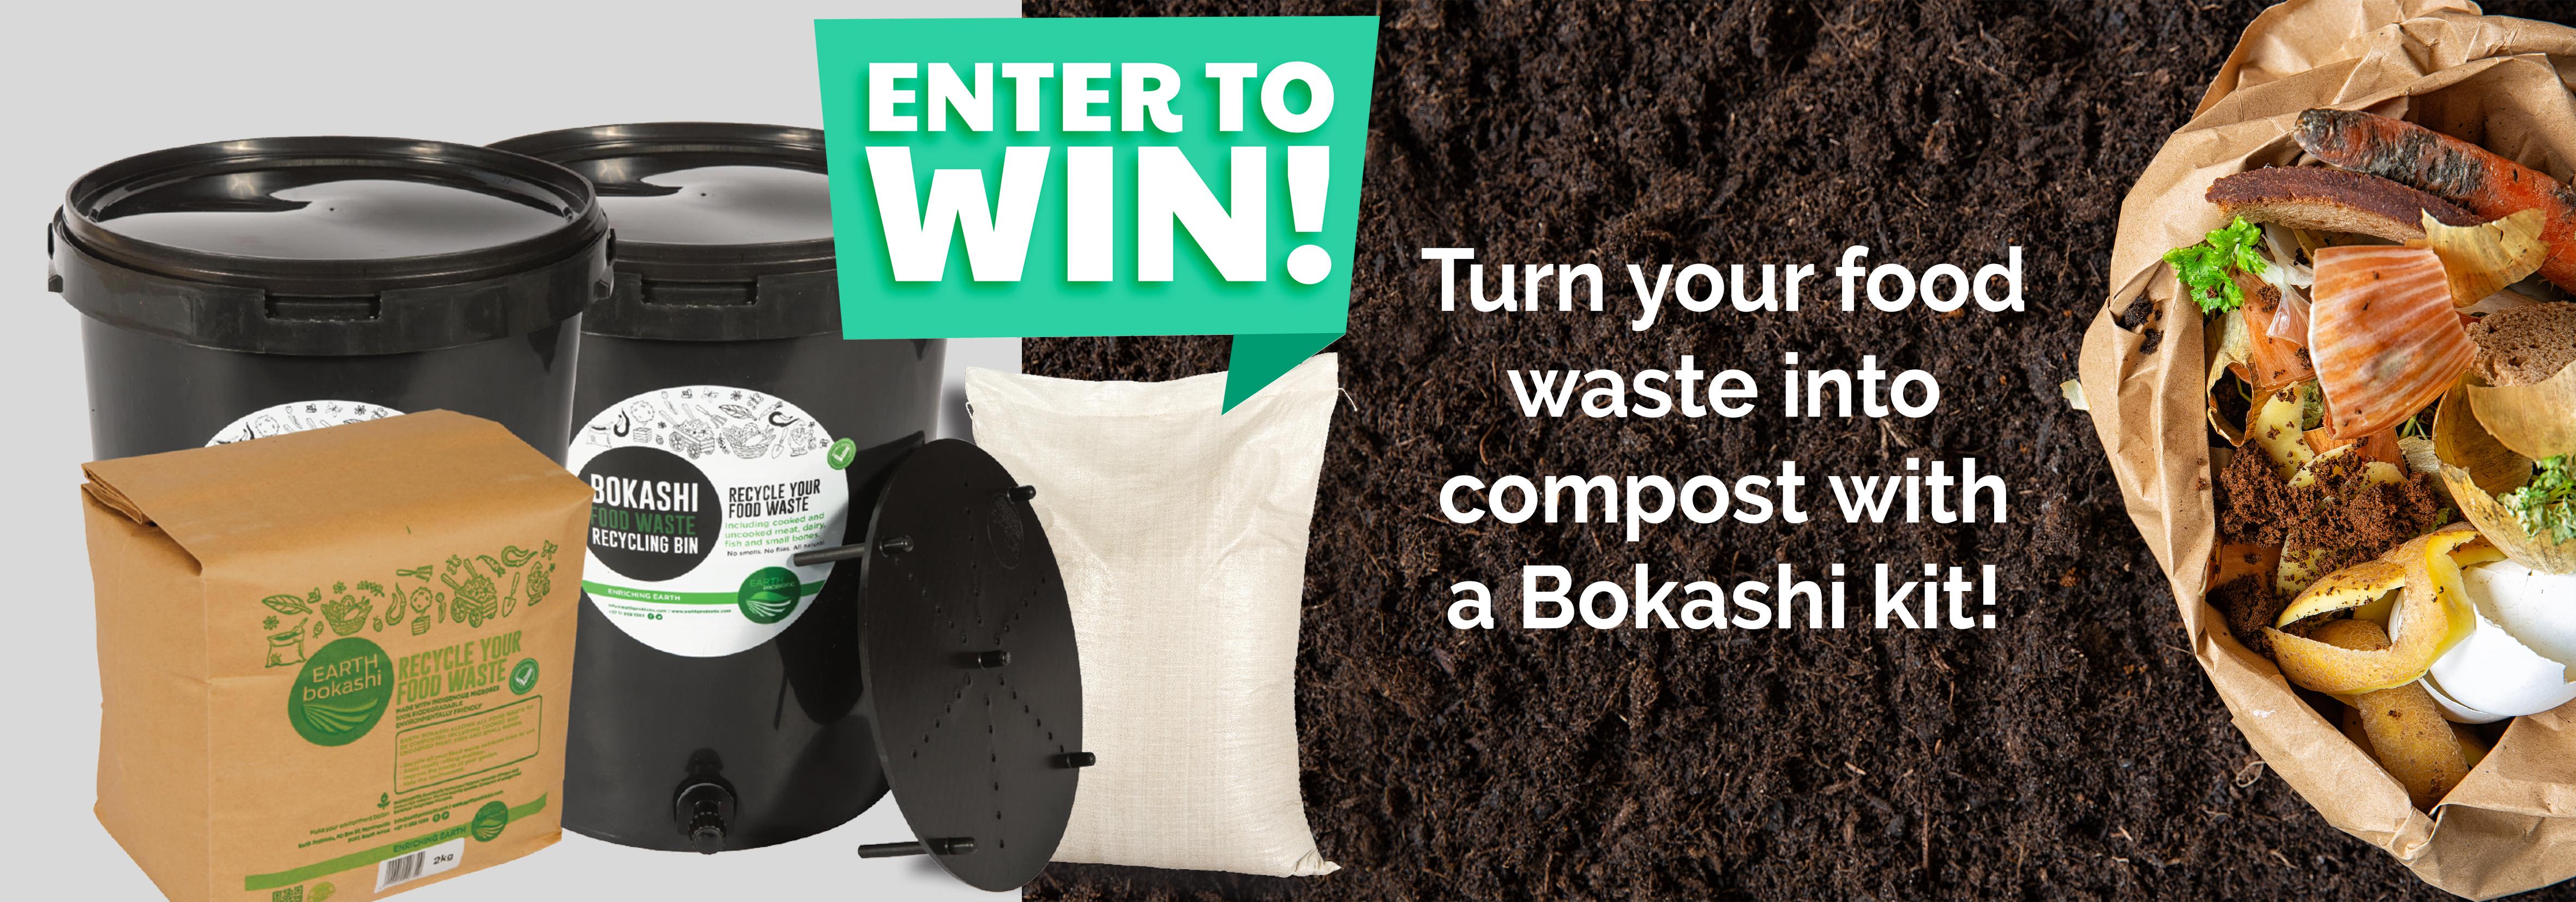 win a bokashi compost maker